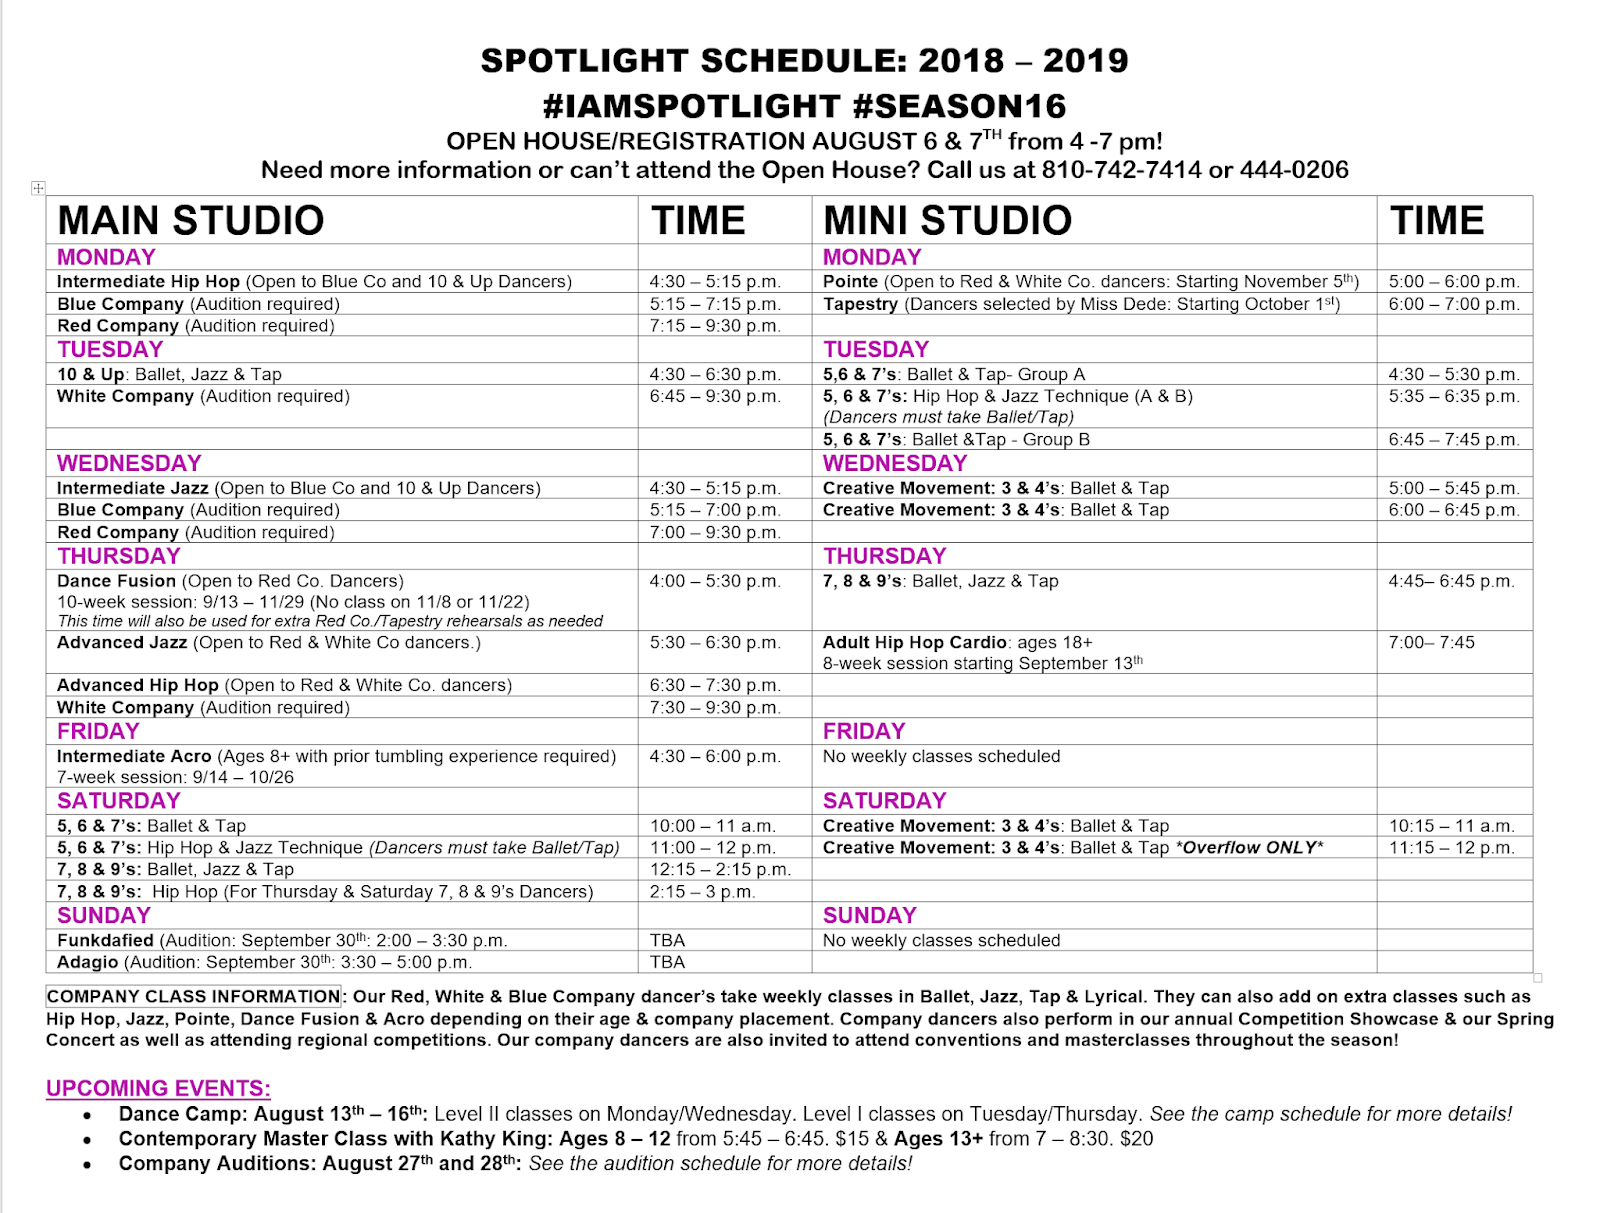 DeCamp's Spotlight School of Dance: 2018 -2019 Audition Music